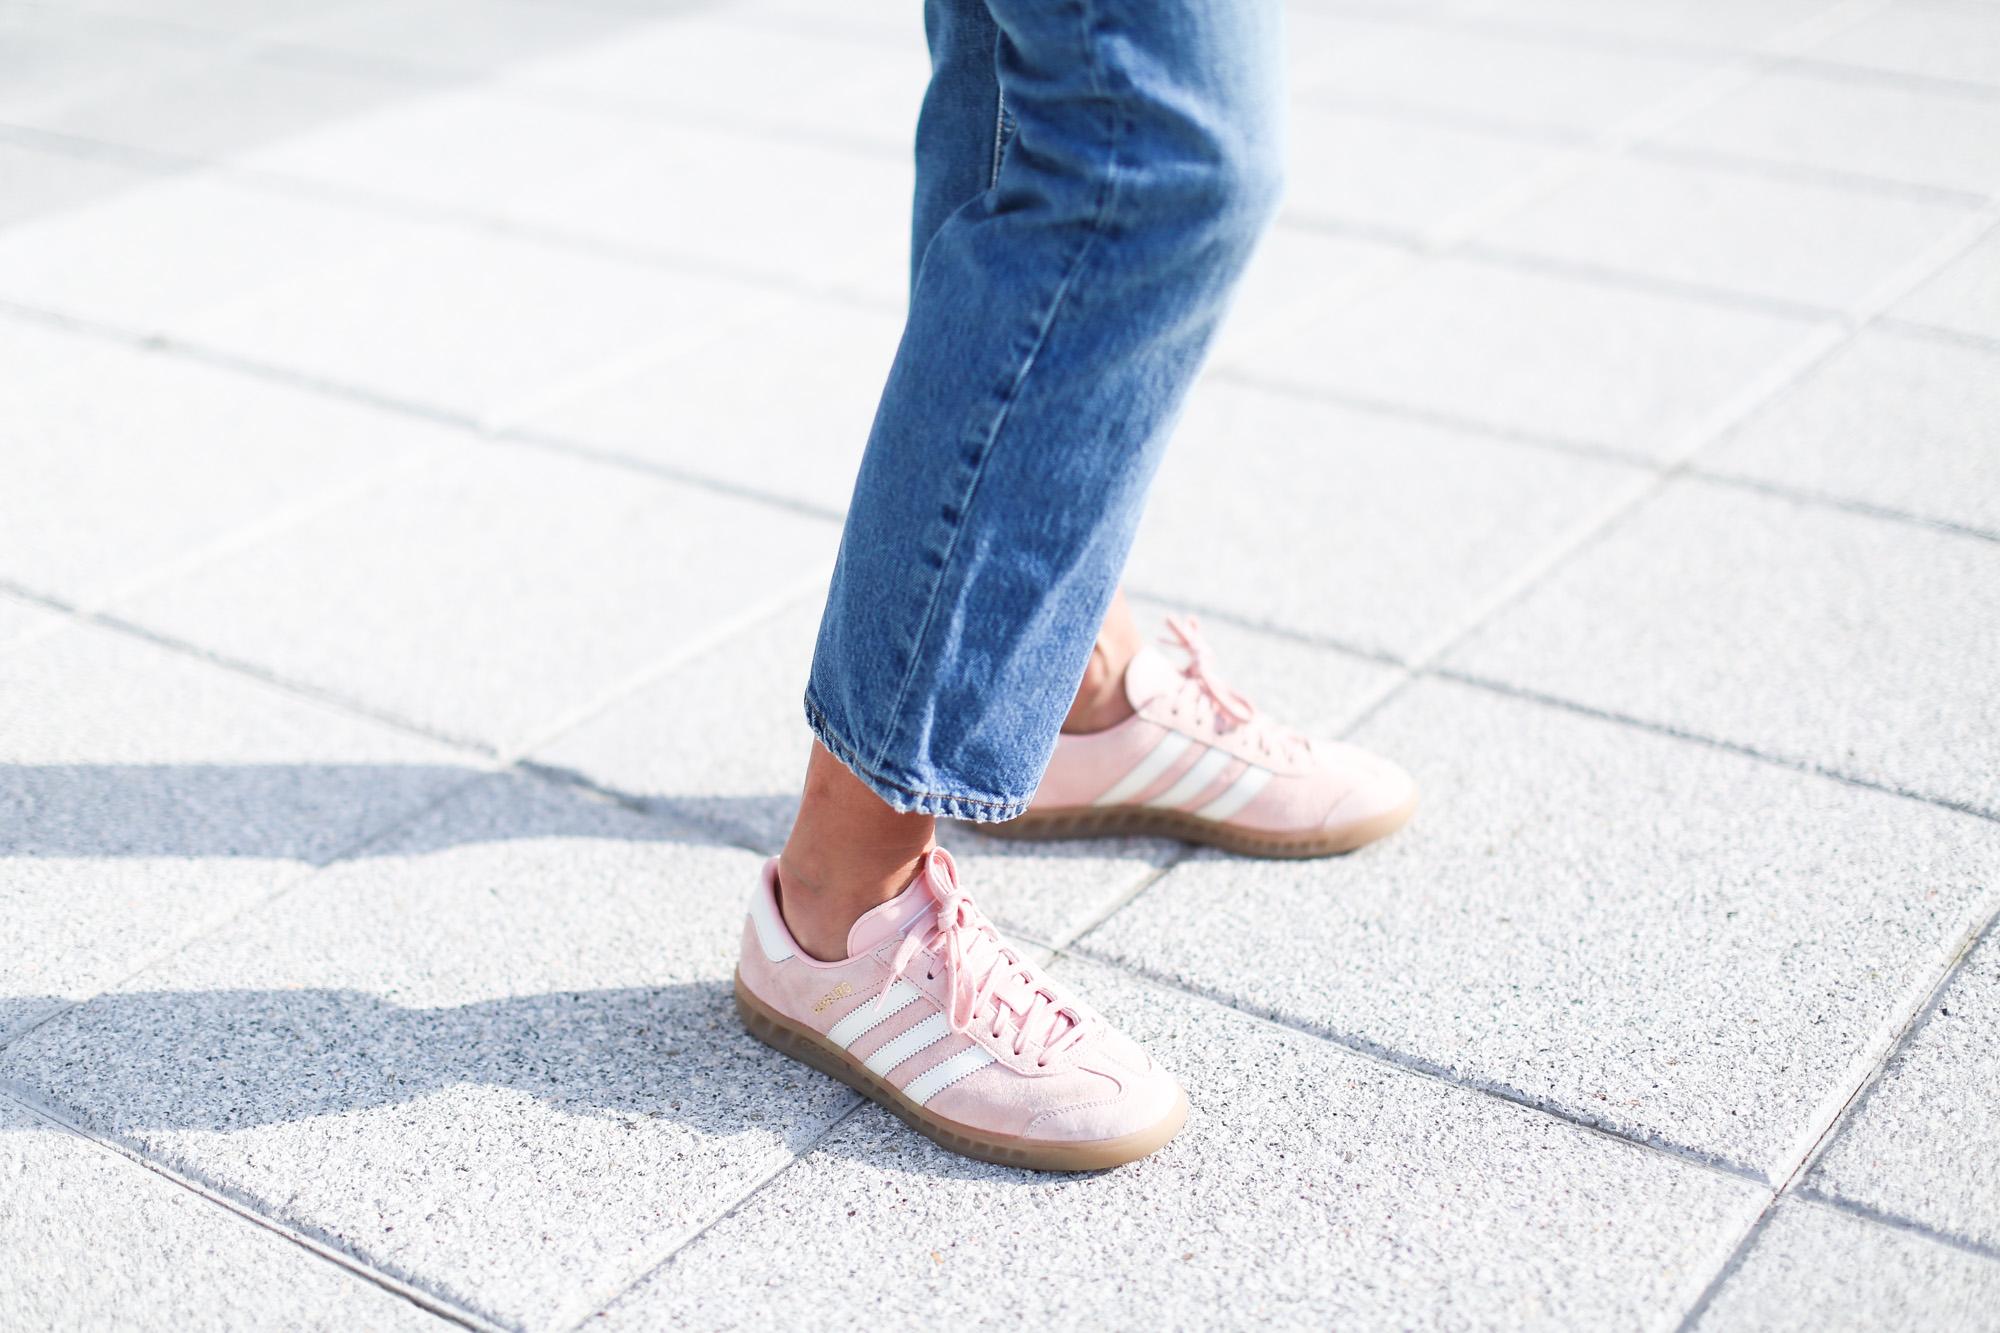 Clochet_streetstyle_fashionblogger_asosfauxfurteddycoat_pinkadidashamburg_leztinstreet_acnestudiosjeans_pop-5